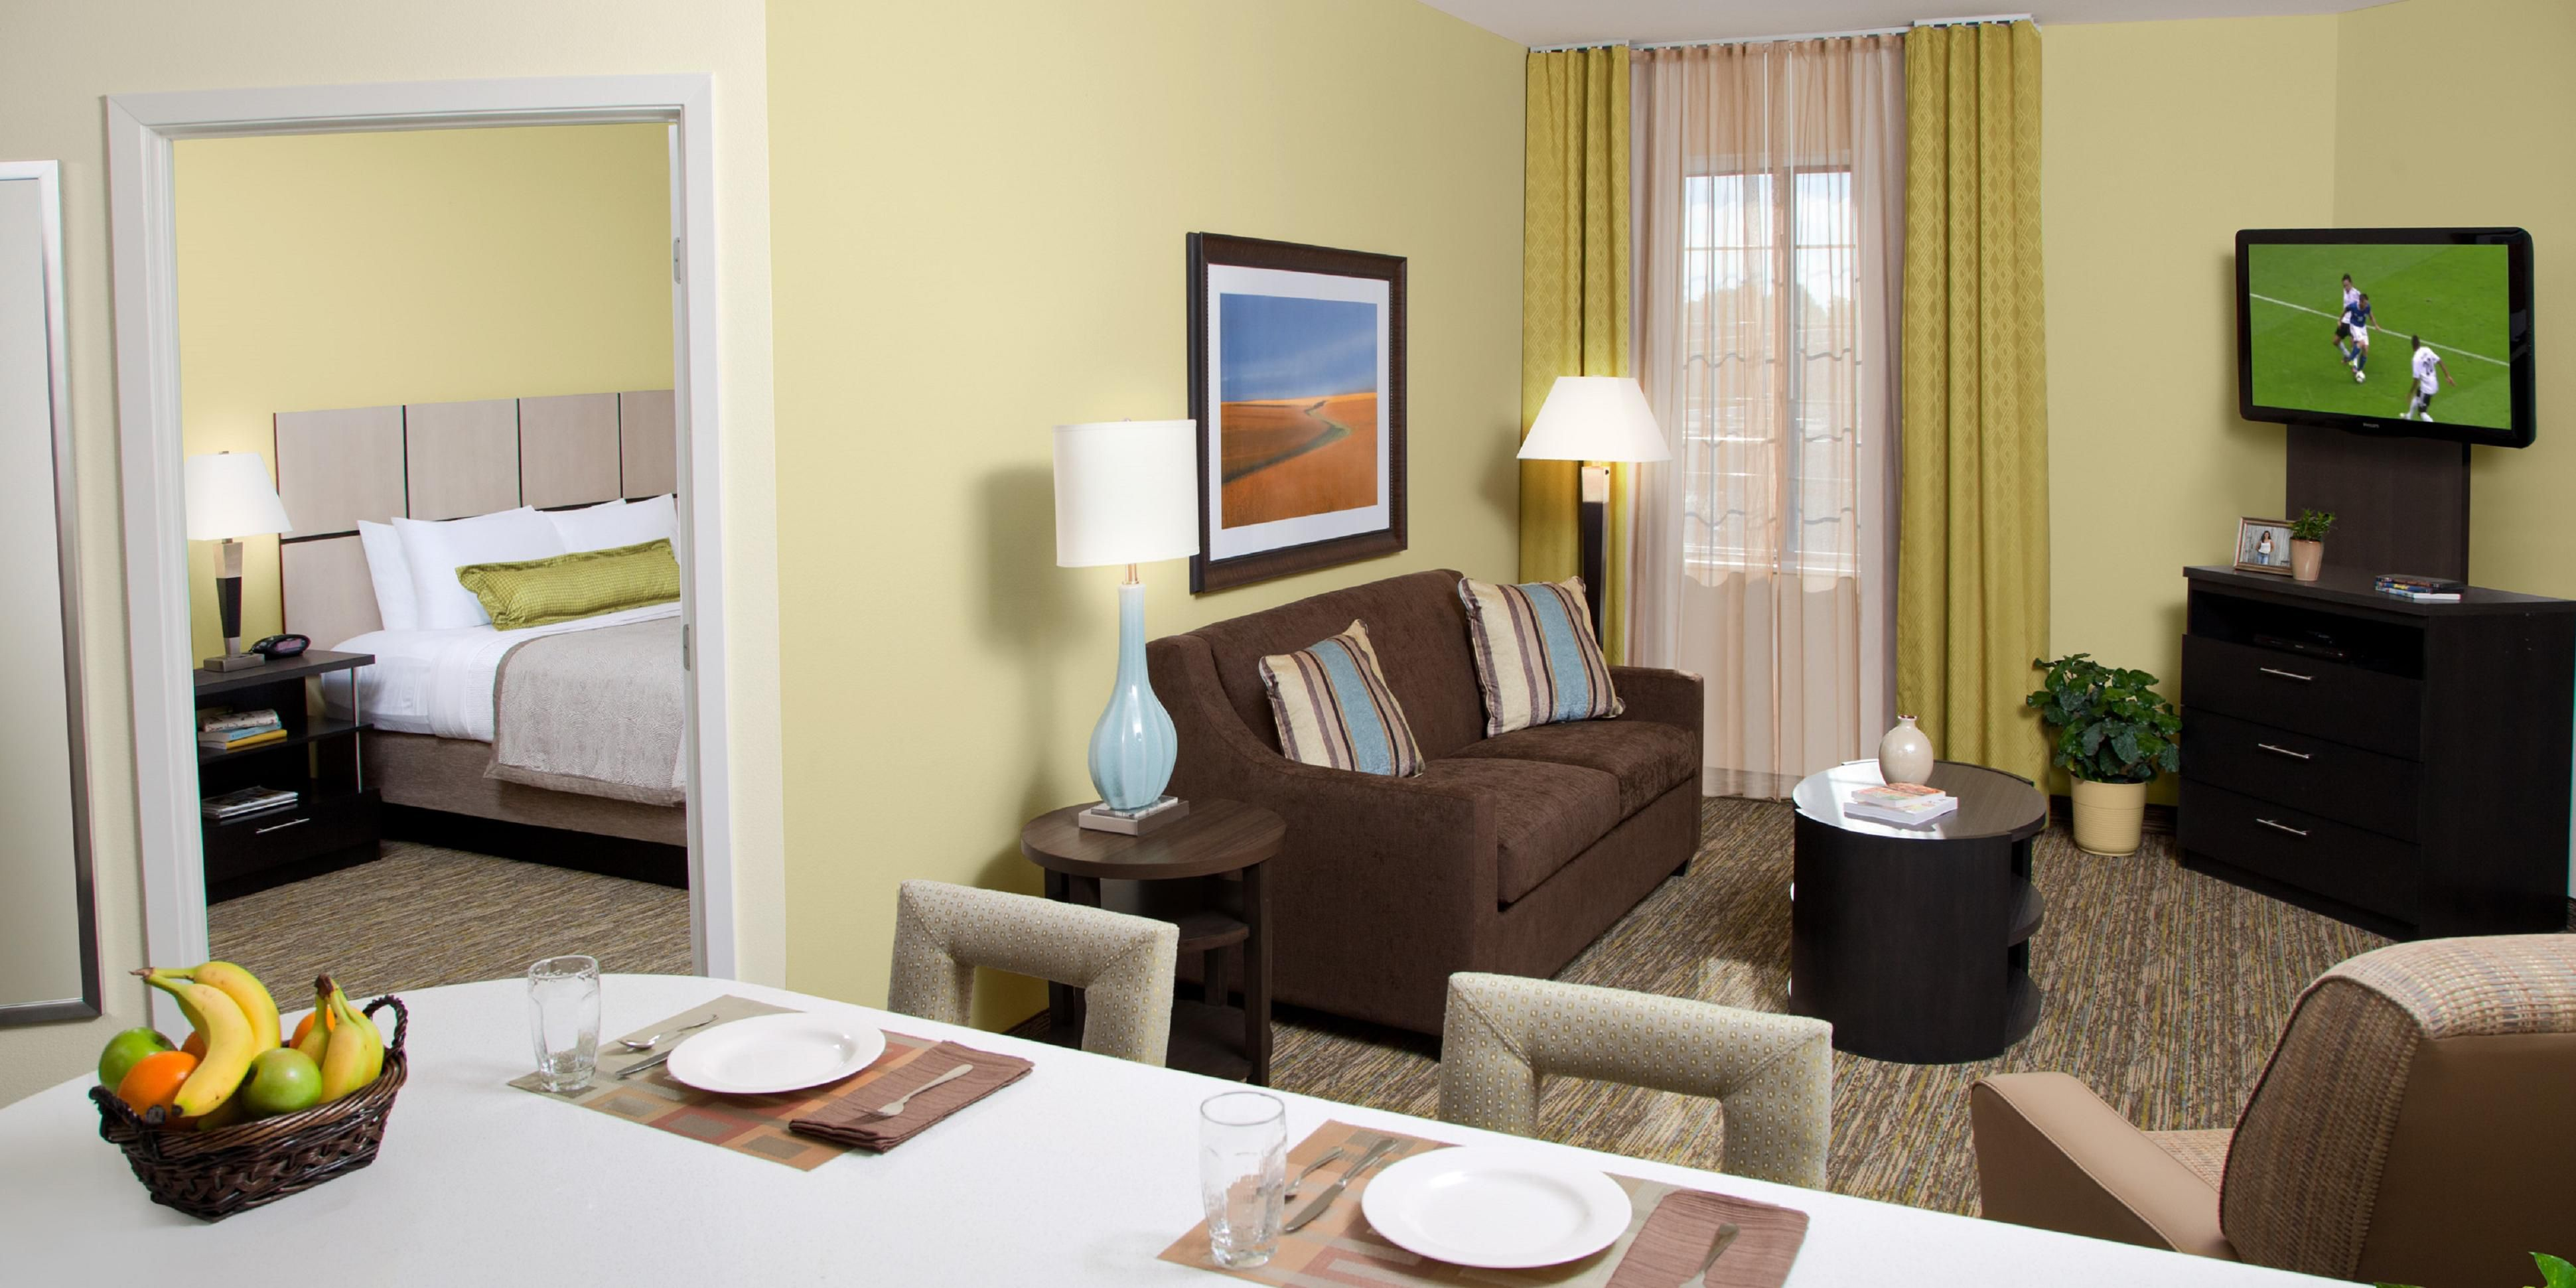 Furniture Source Des Moines #37: Room Photos